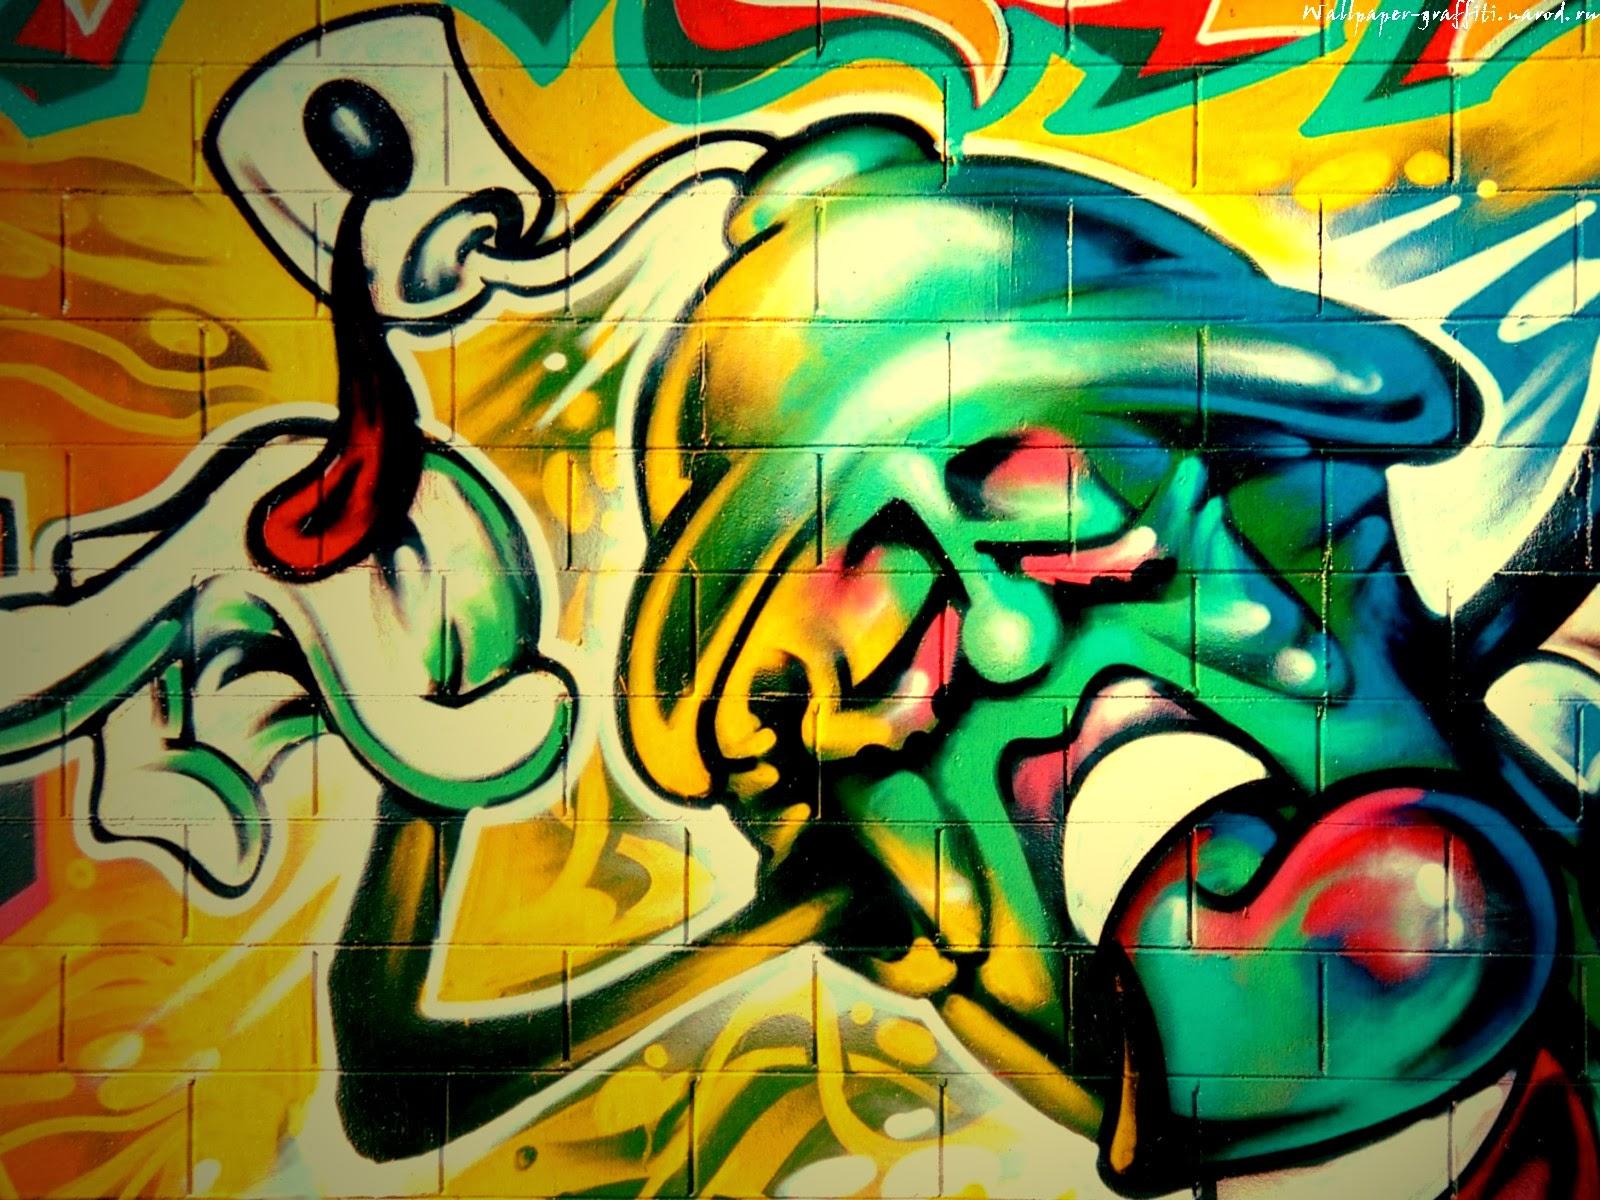 3d Street Art Graffiti Wallpaper Graffiti Wall Graffiti Wallpaper